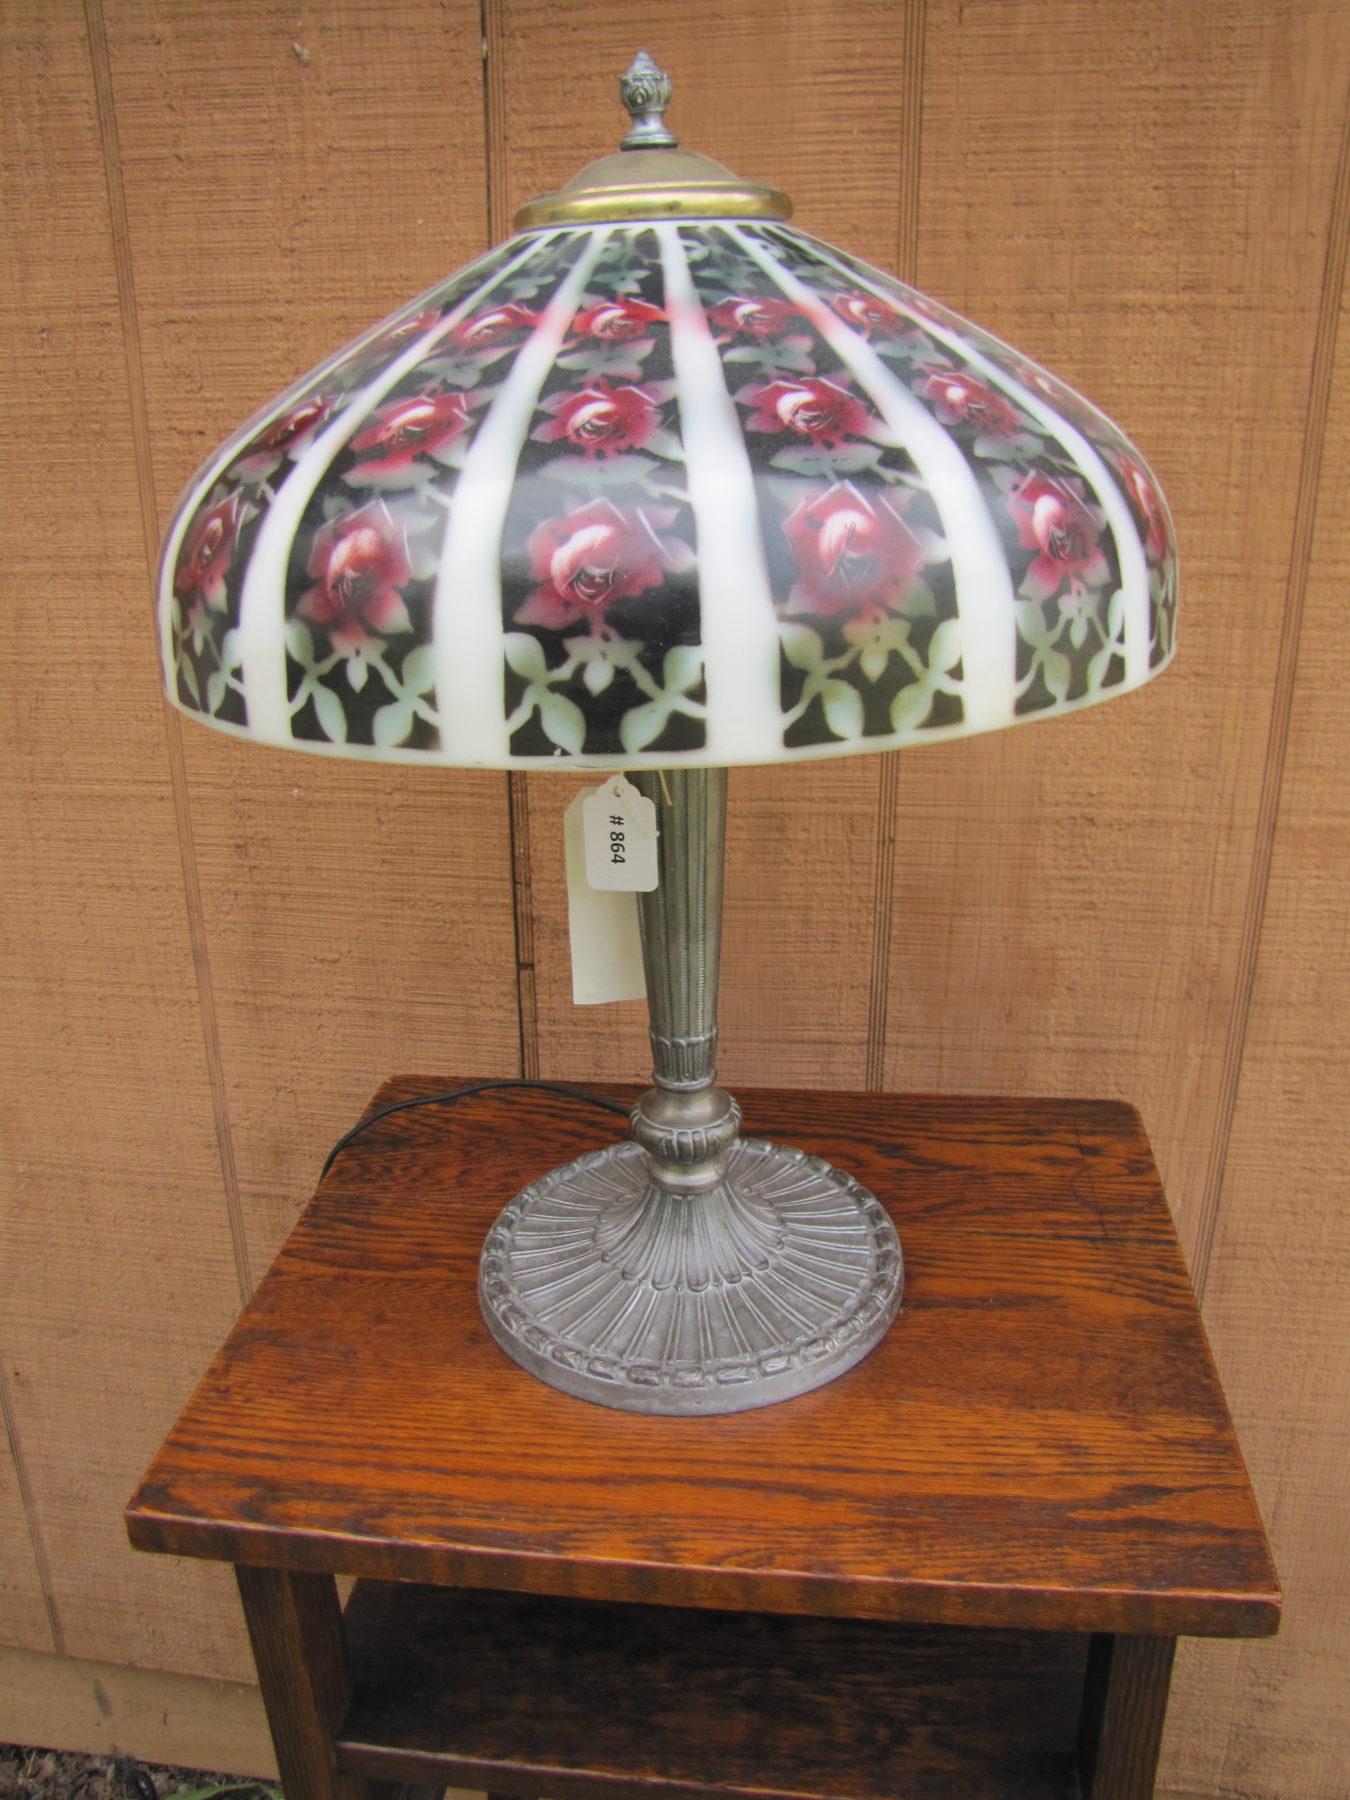 Home » Shop » Antique Furniture » Lighting » Vintage Pittsburgh Table Lamp  w2084 - Vintage Pittsburgh Table Lamp W2084 - Joenevo